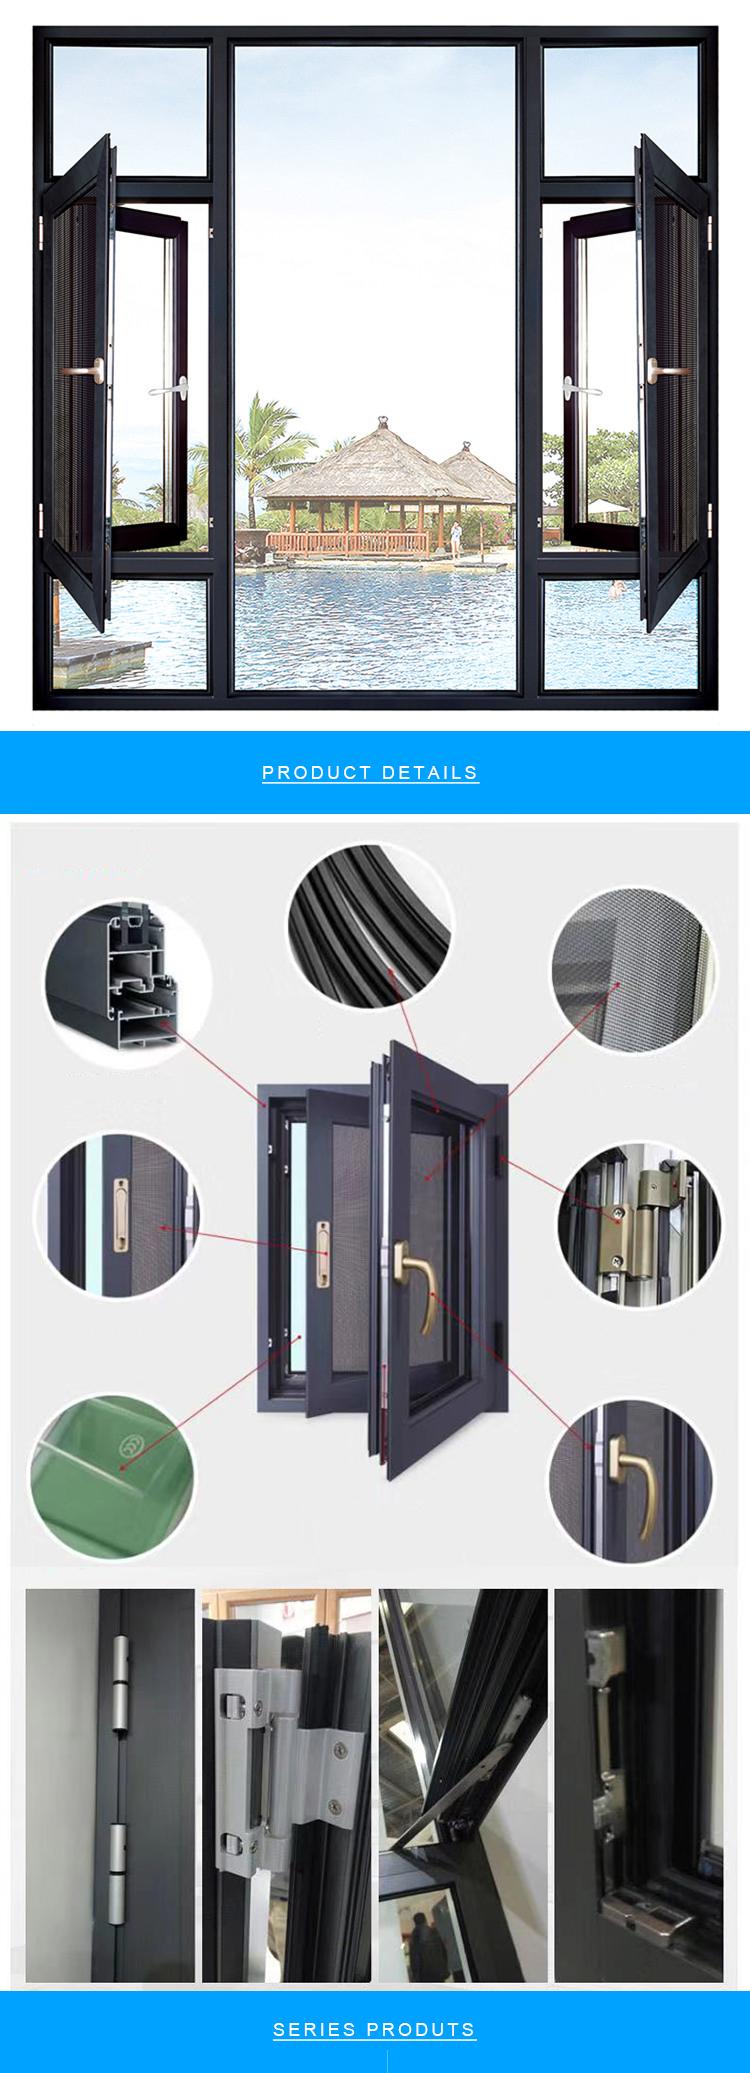 Aluminum alloy double  glass thermal-break casement  window with mosquito net